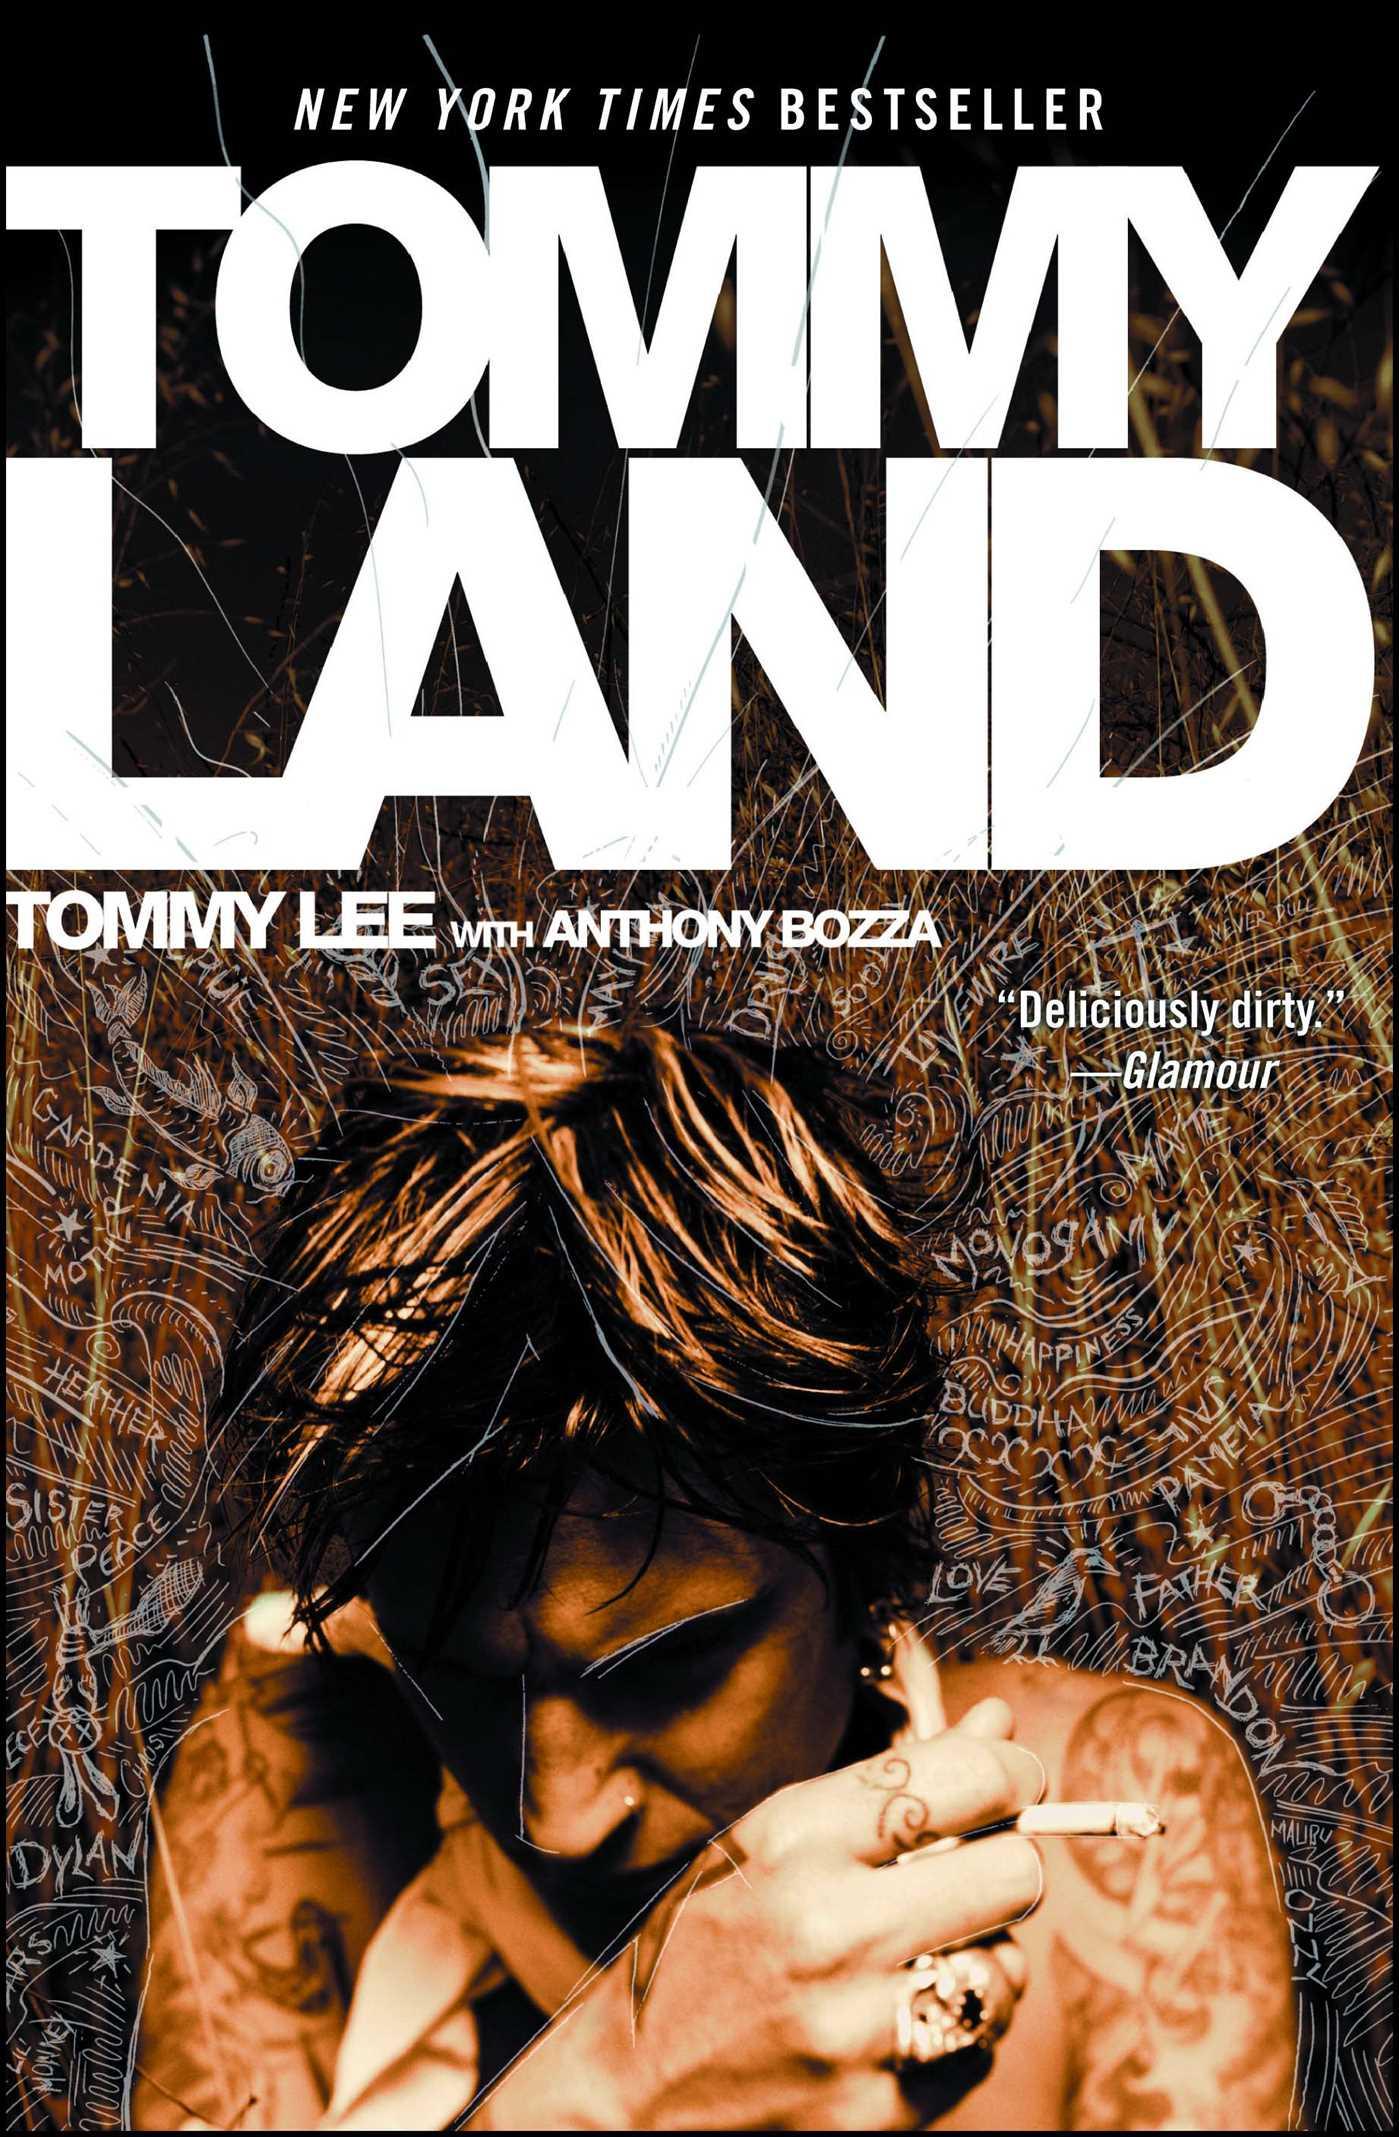 Tommyland 9780743483445 hr